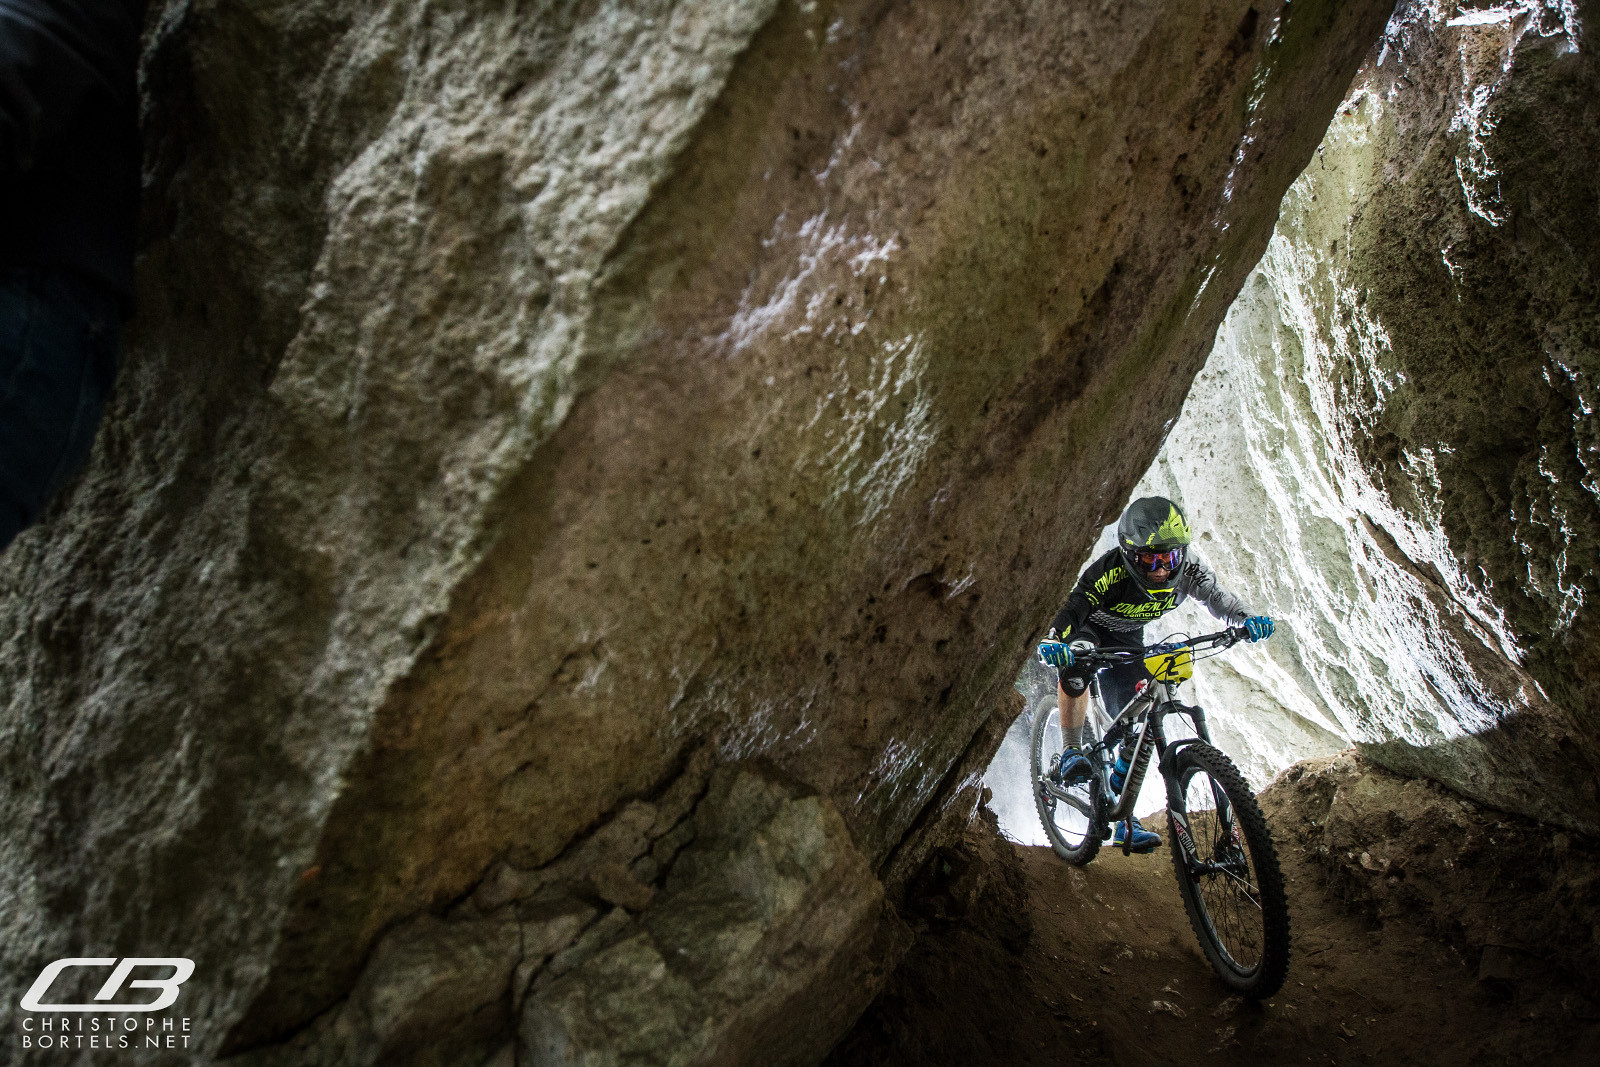 The Cave - chrisbortels - Mountain Biking Pictures - Vital MTB